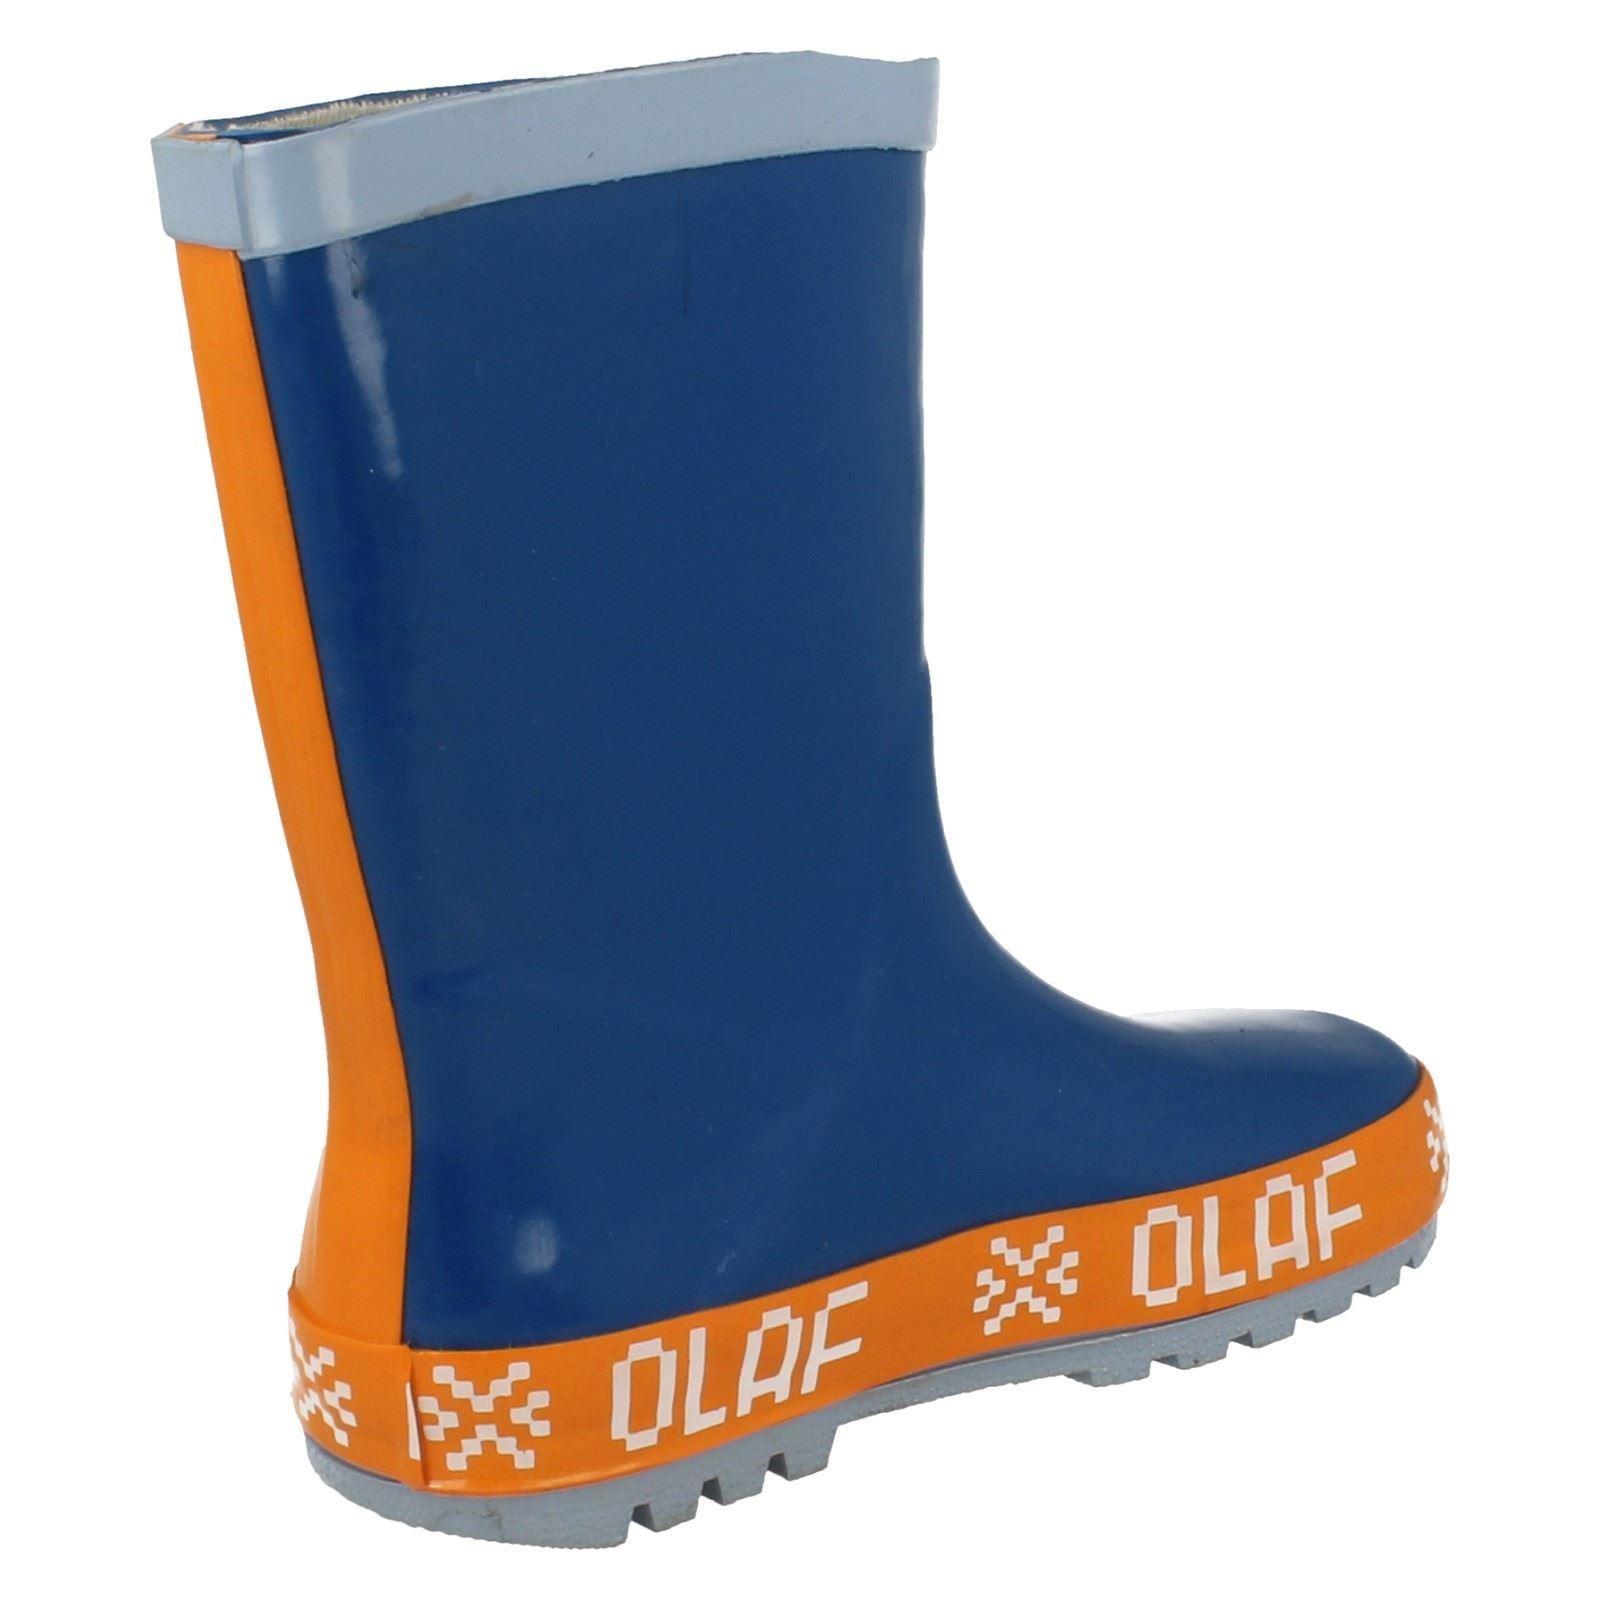 Chicos carácter Diseño Frozen Olaf Wellingtons